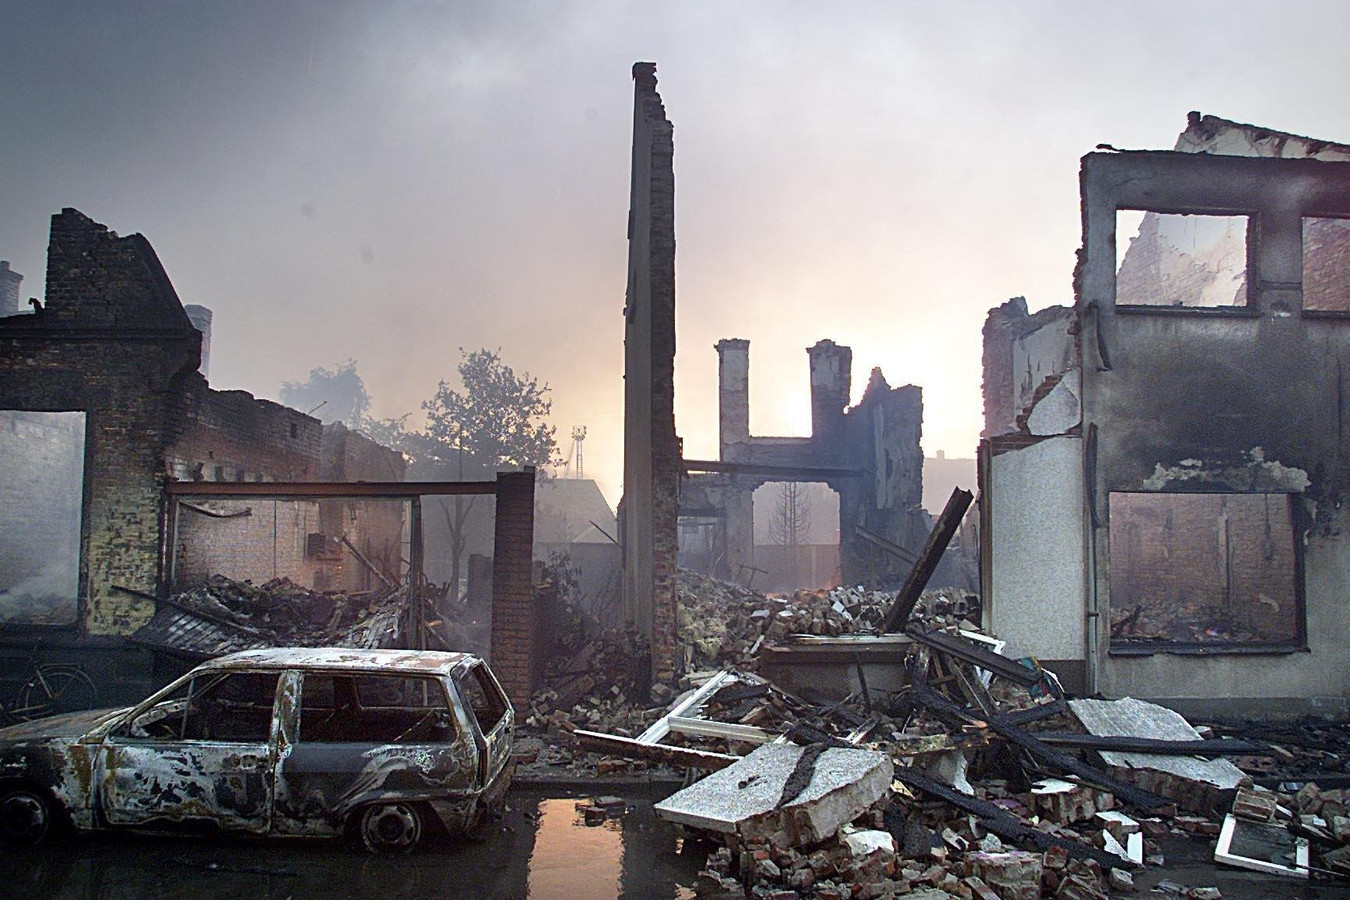 Huizen zijn weggevaagd na de ontploffing bij SE Fireworks